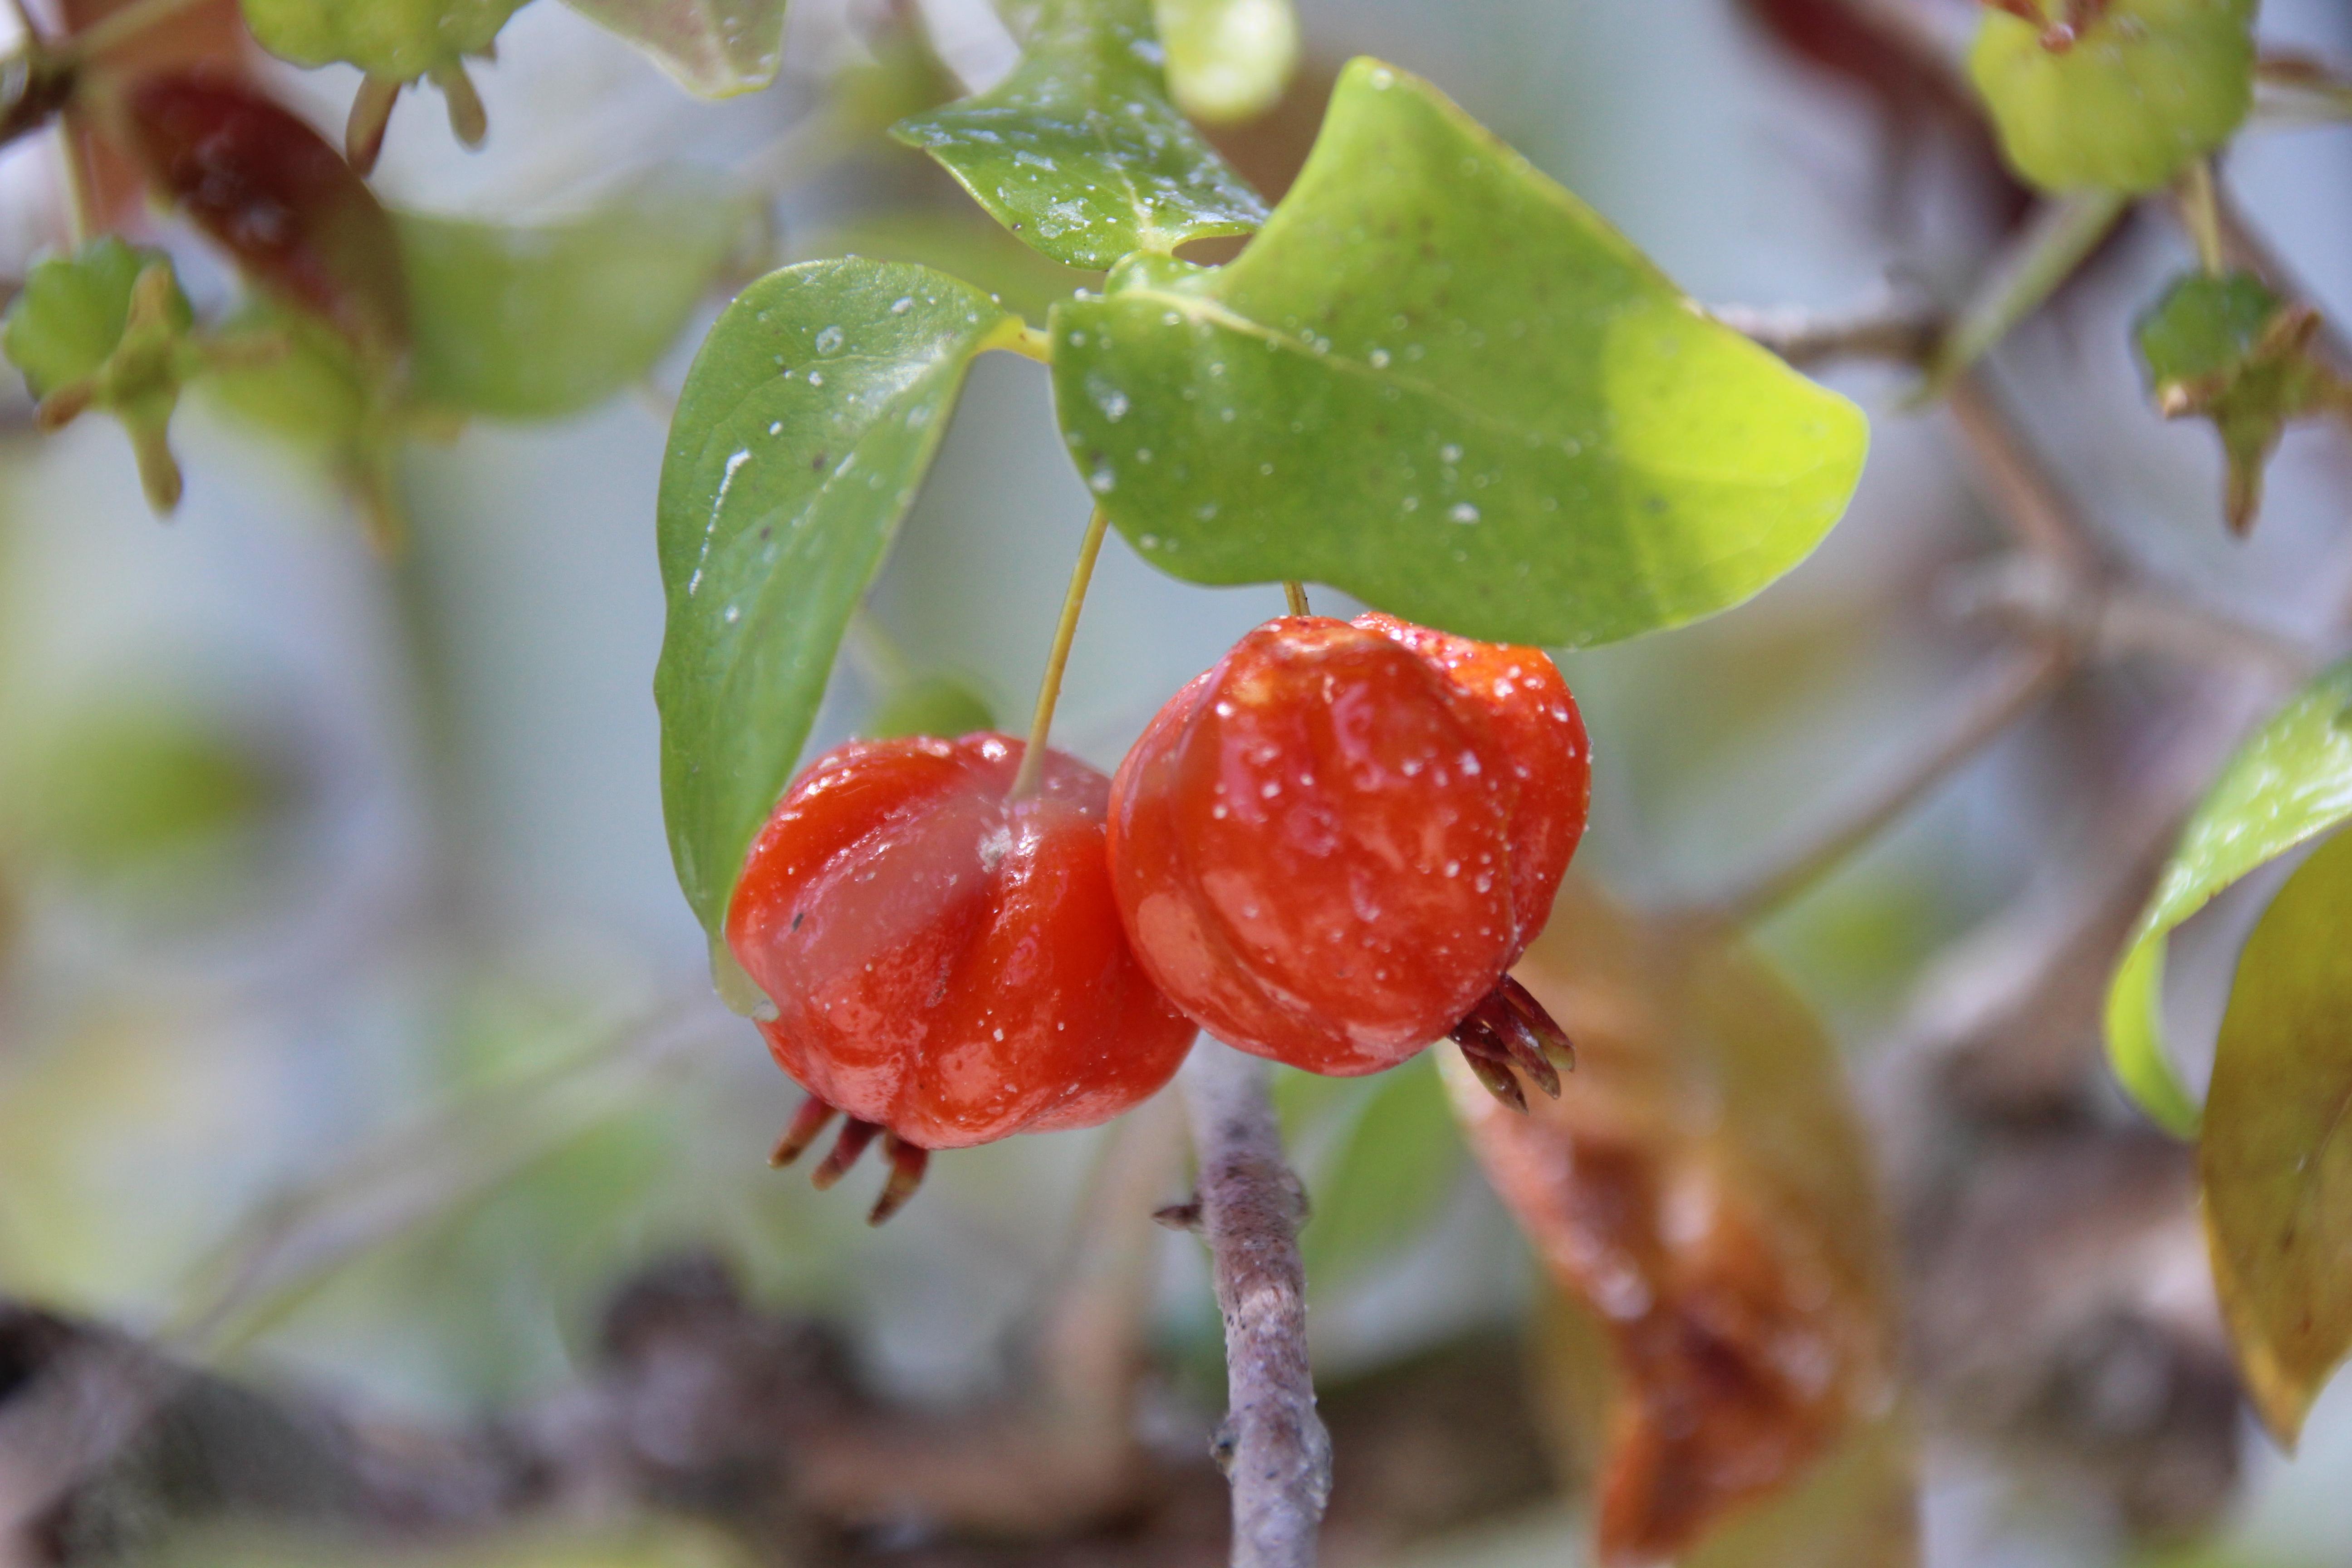 floweralley – Flora and fauna in a North Carolina garden.